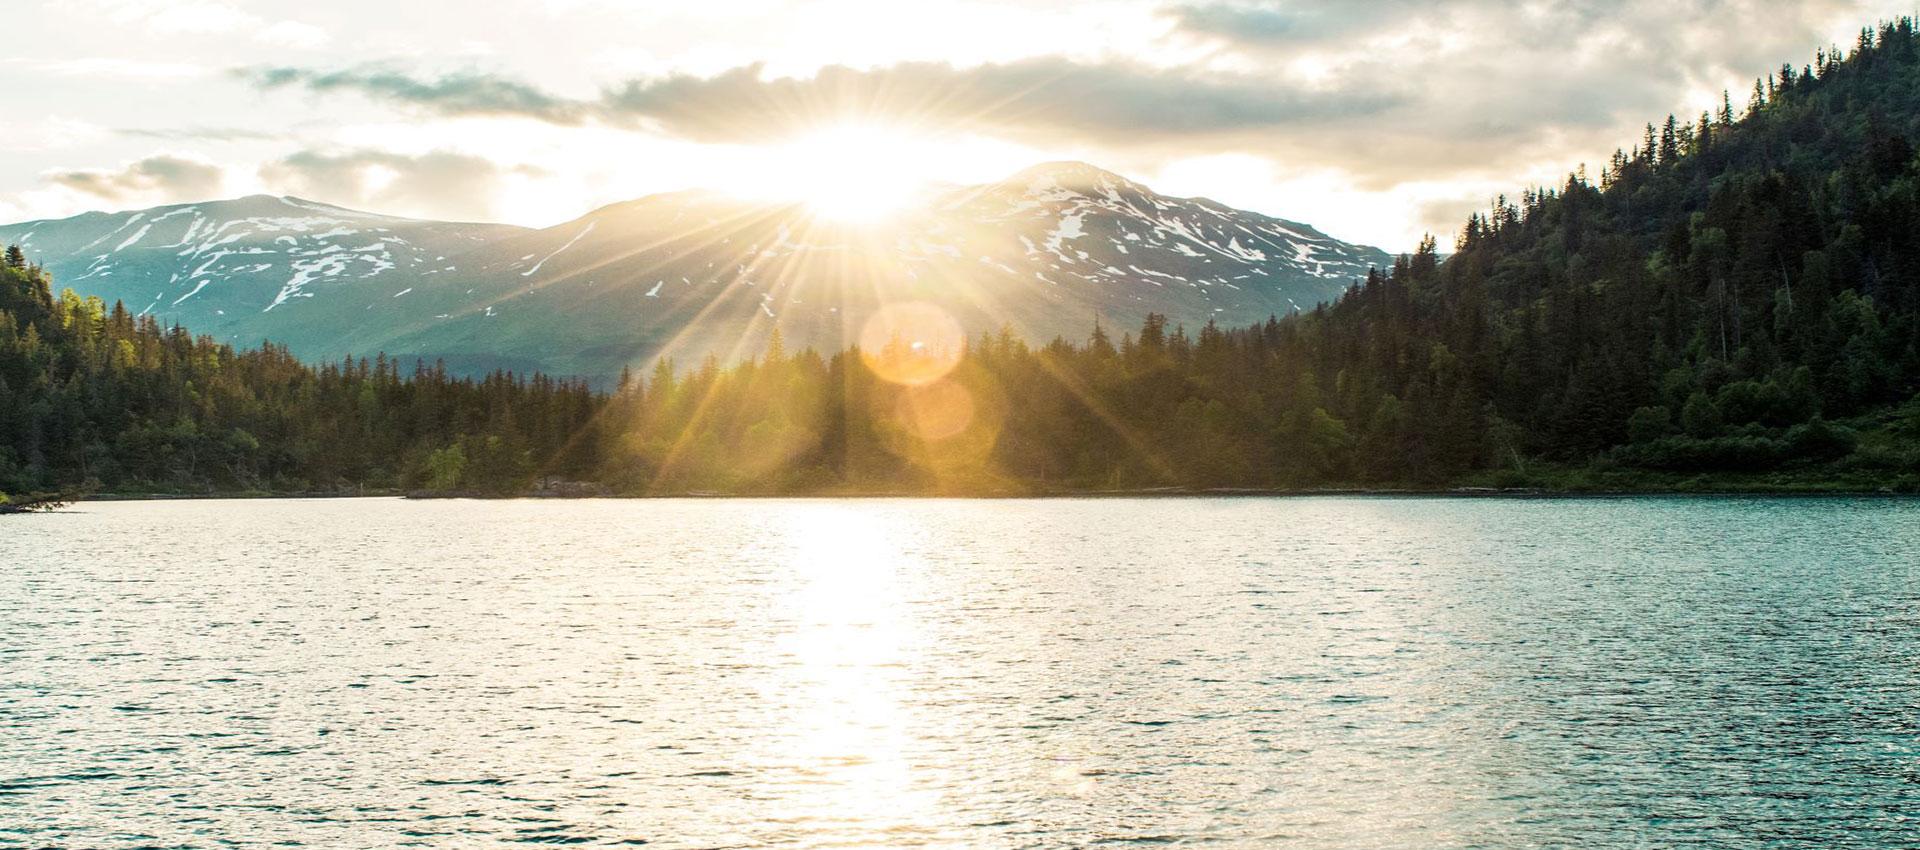 Sun setting over mountain lake